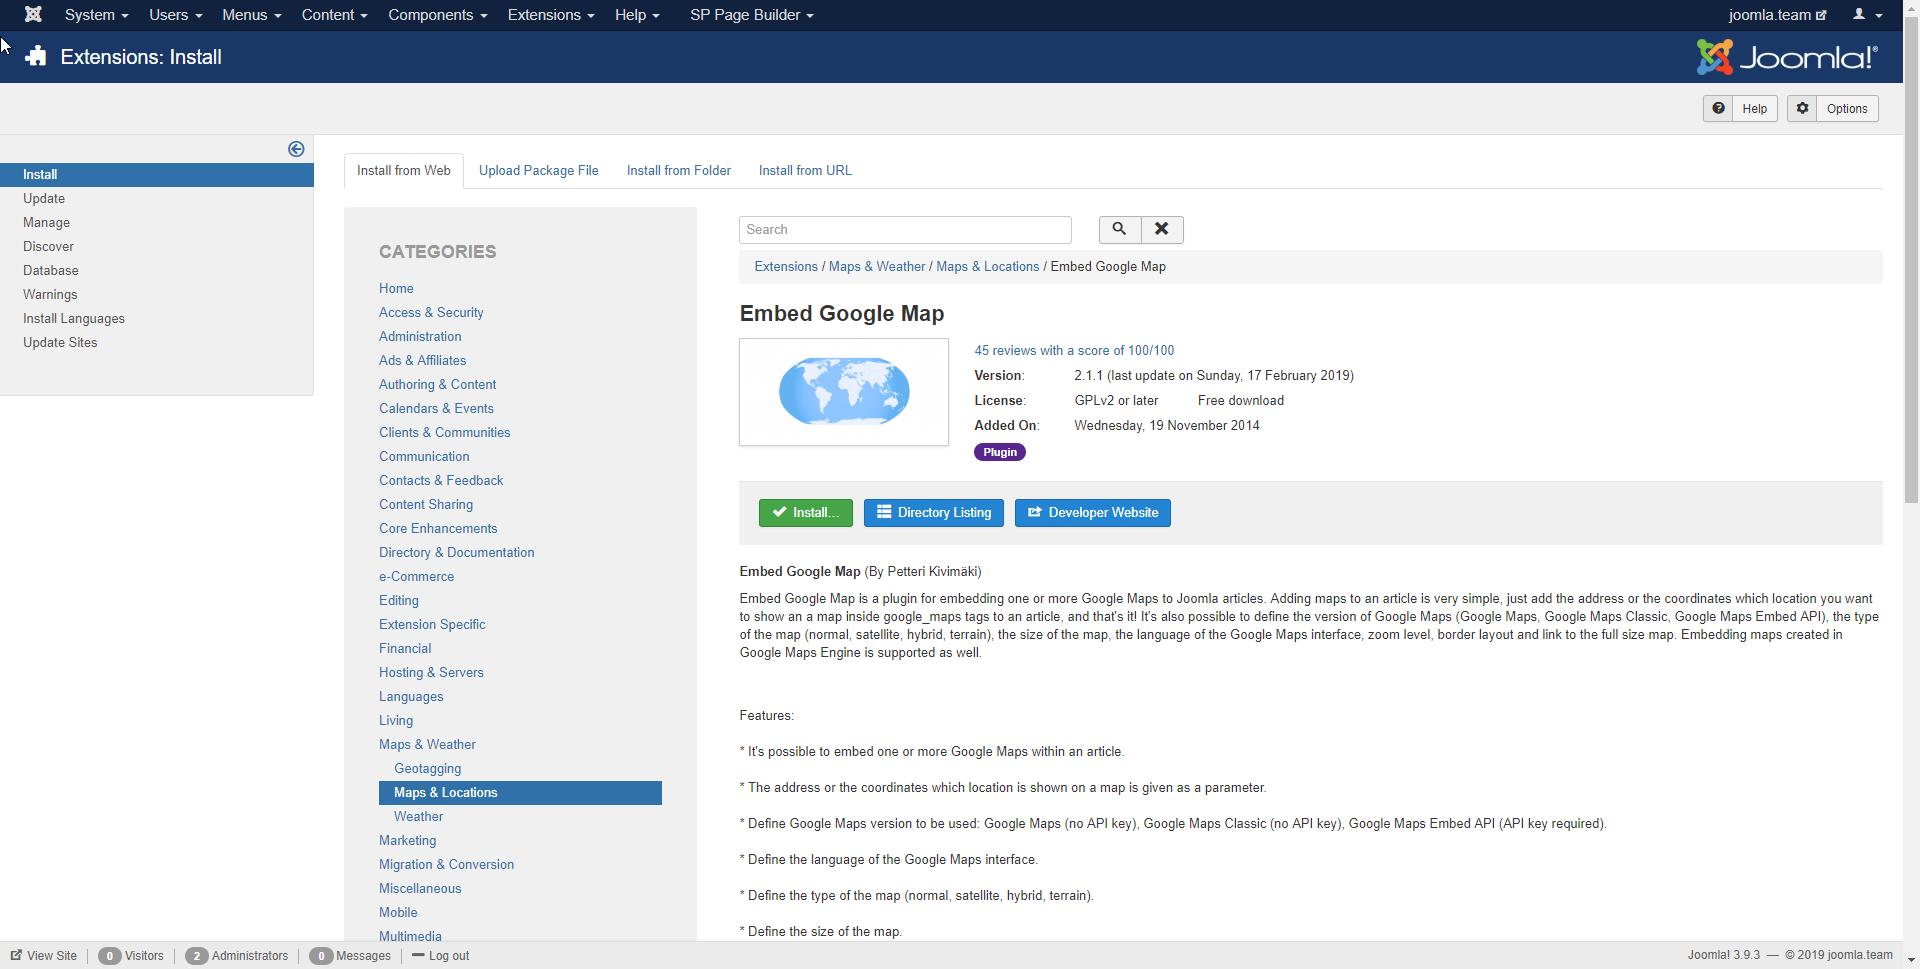 Adding a Google Map to your Joomla site | joomla team